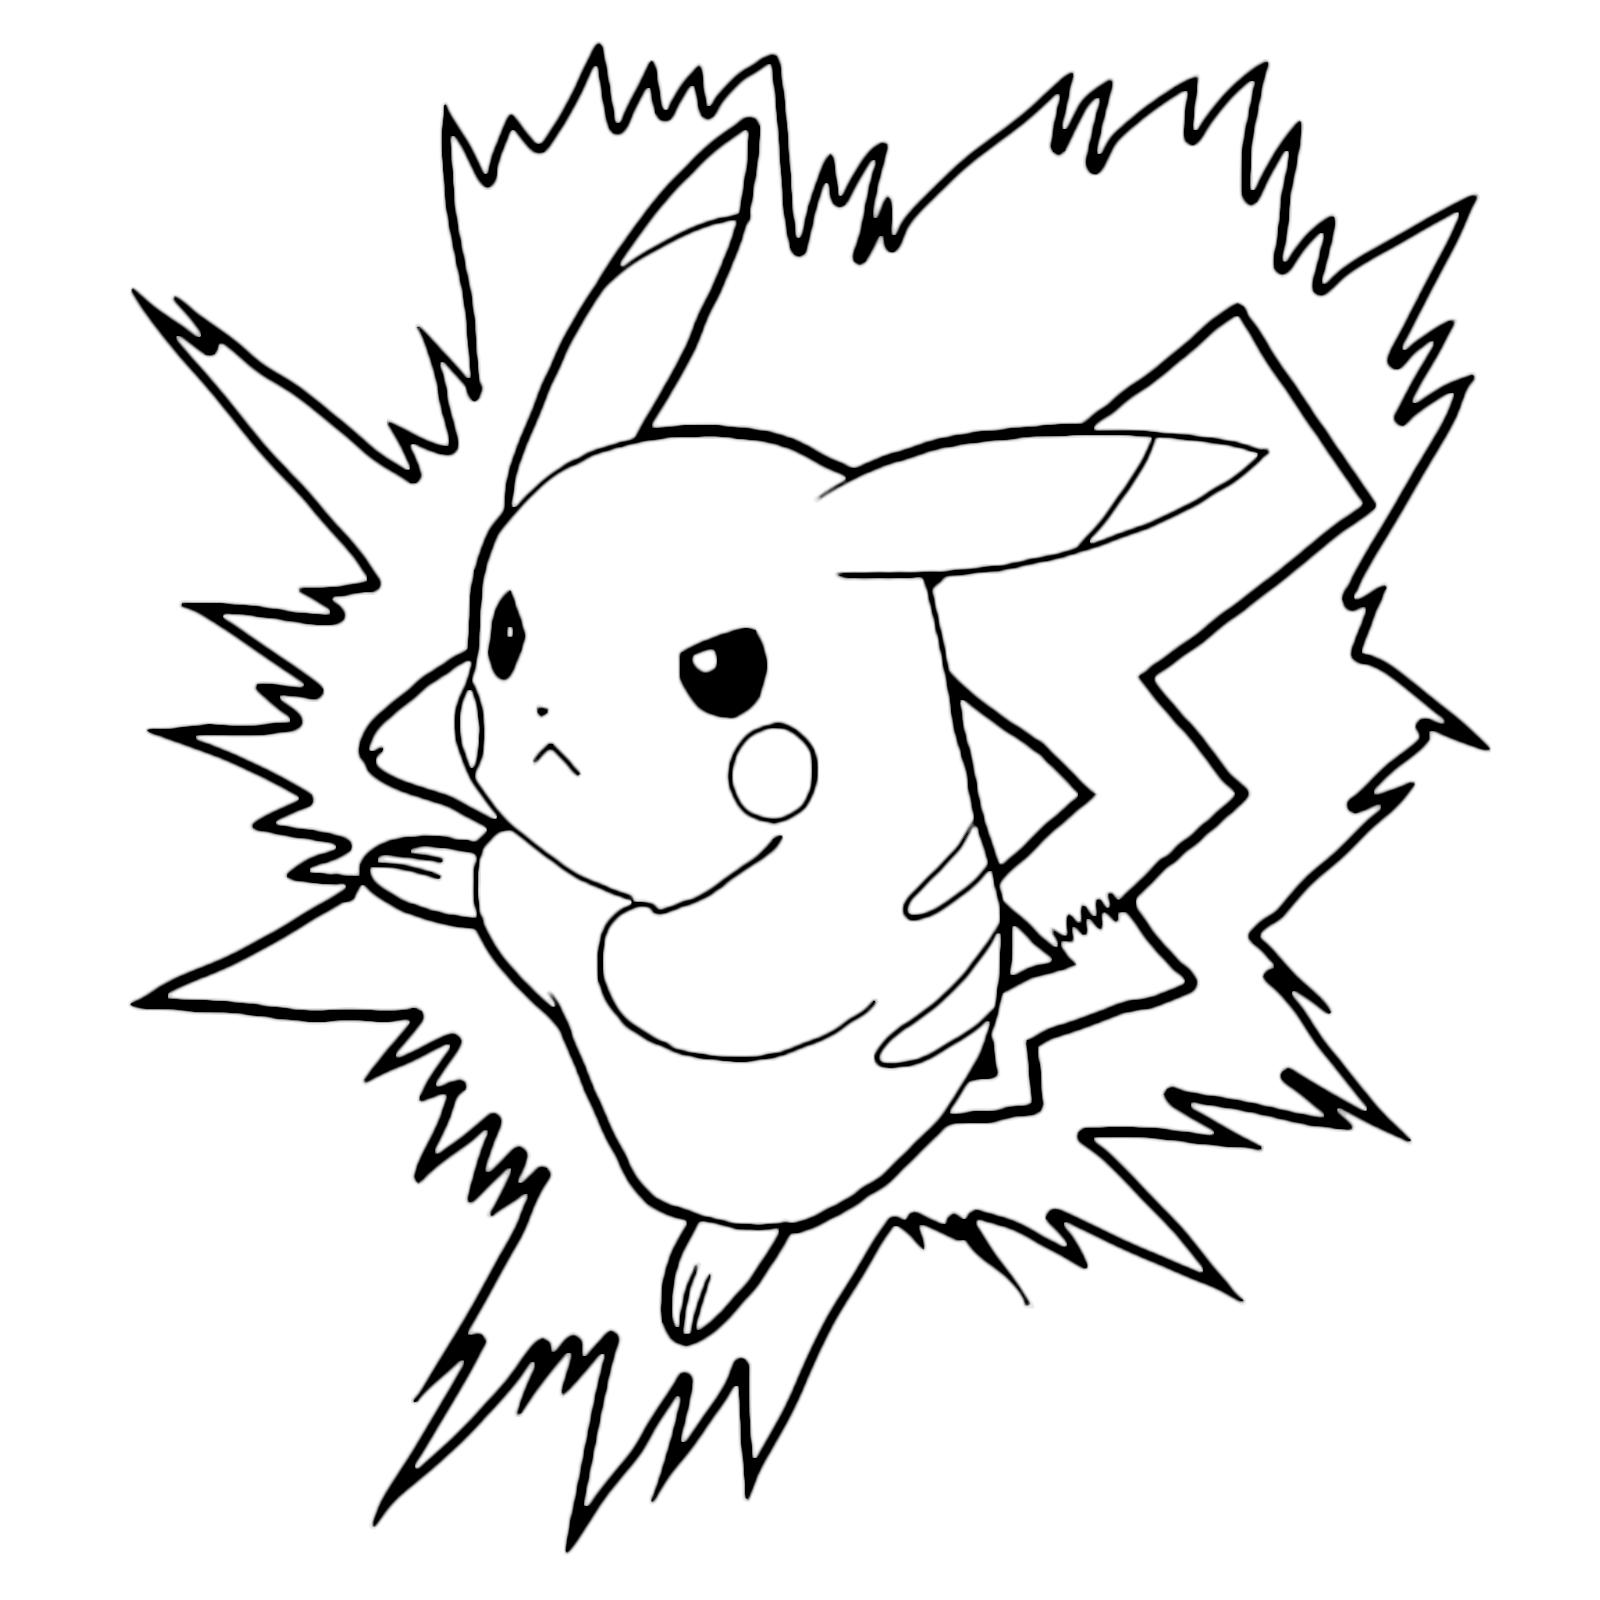 Pokémon Gen 1 Pikachu Arrabbiato